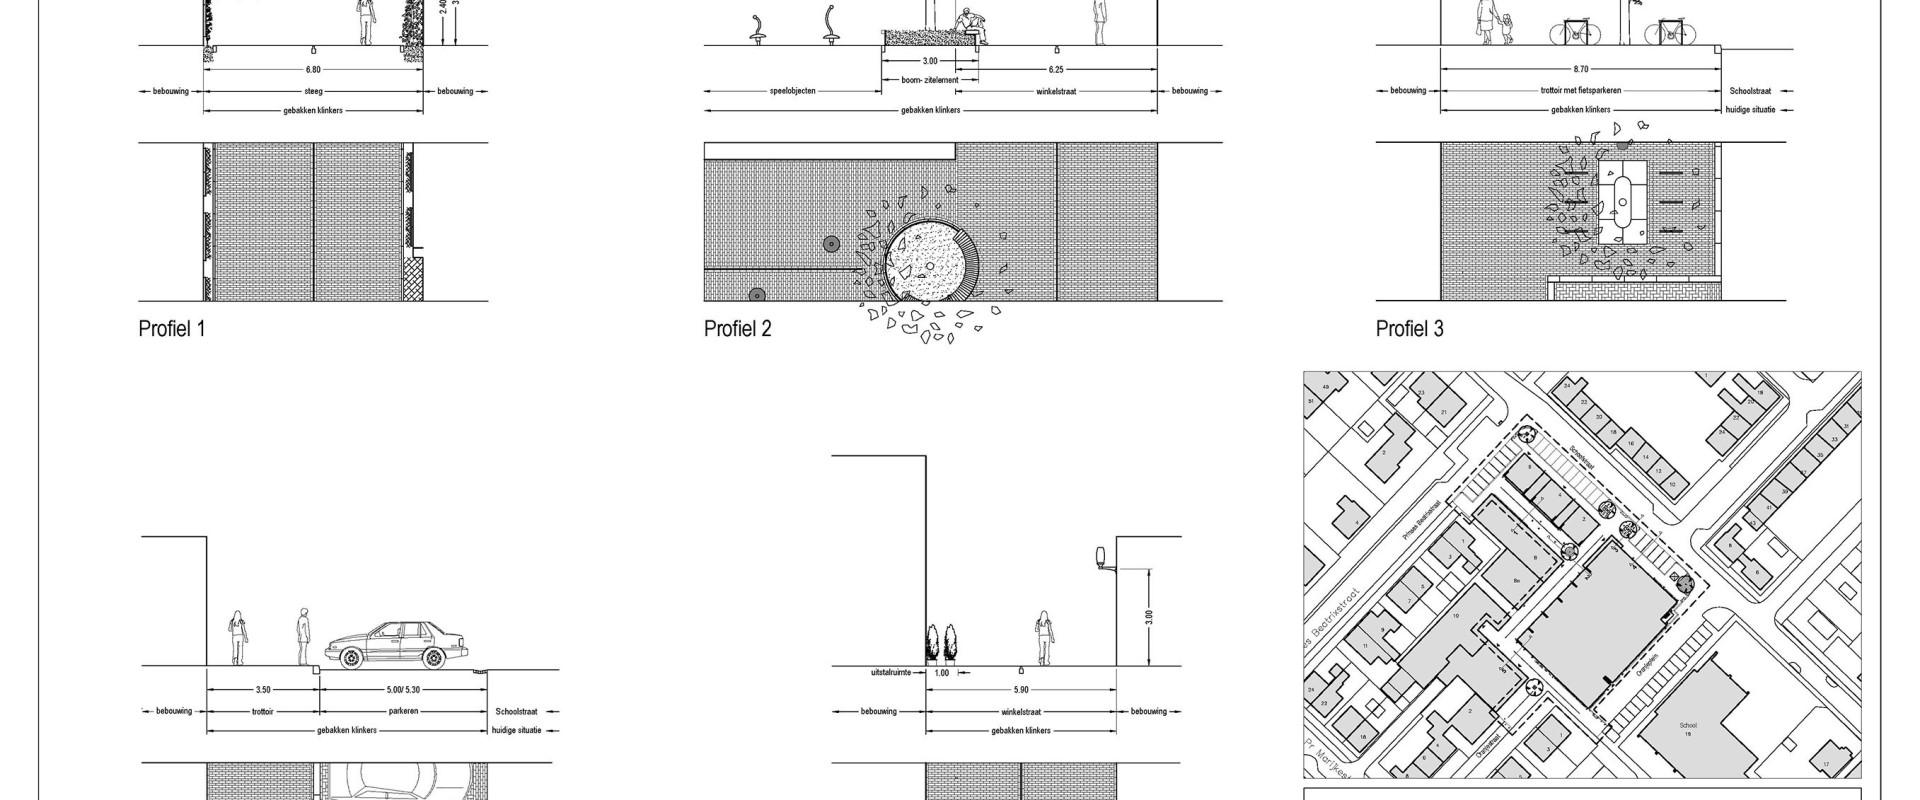 091118_ DO inrichtingsplan Oranjeplein A2 profielen 1op100